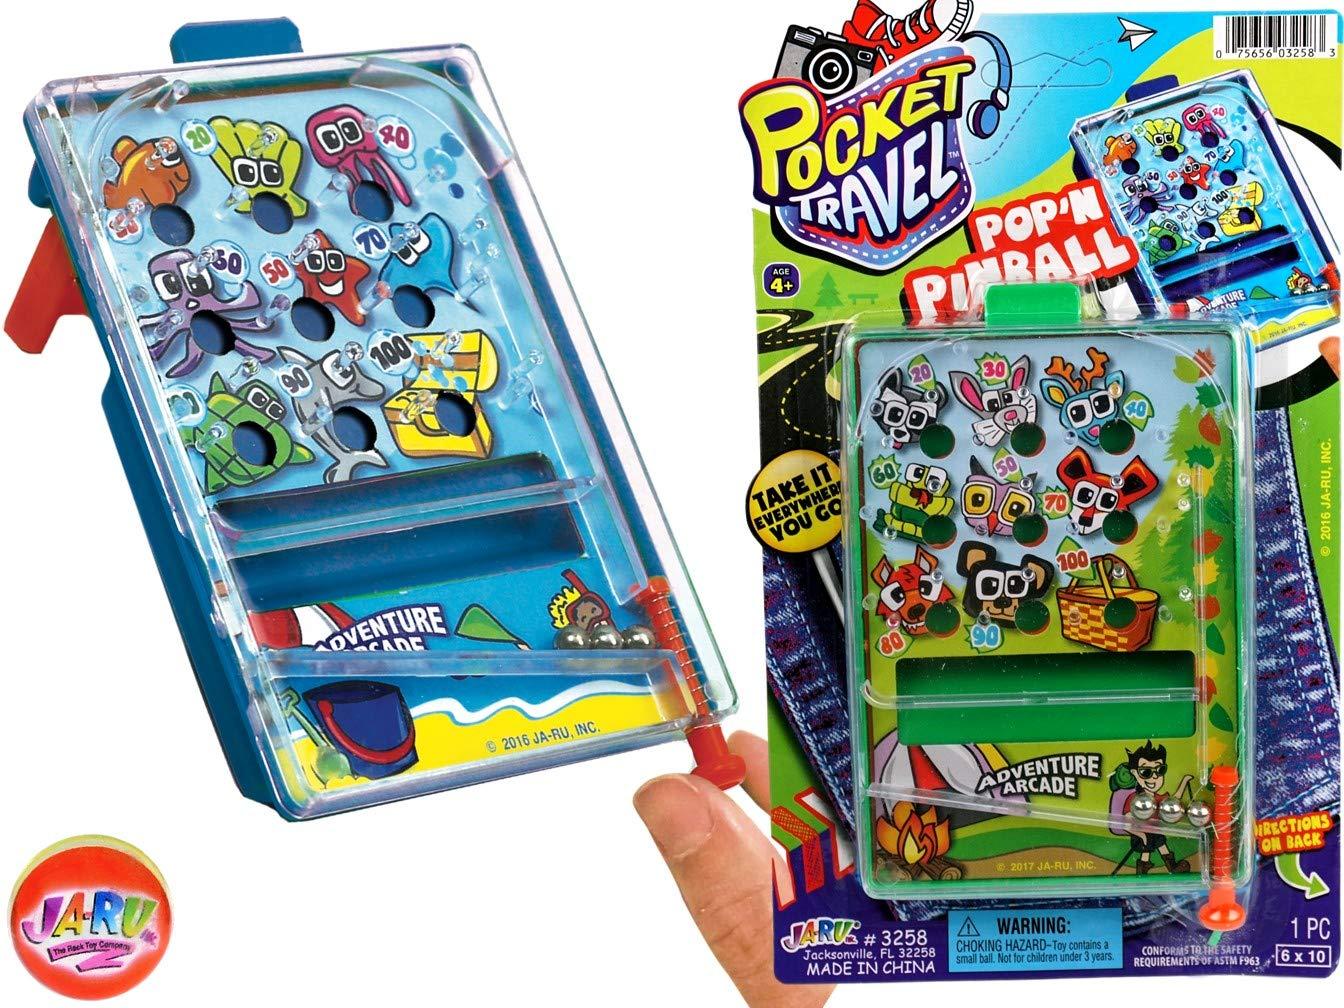 JA-RU Pinball Pocket Travel Game (144 Units) and one Bouncy Ball Item #3258-144p by JA-RU (Image #5)